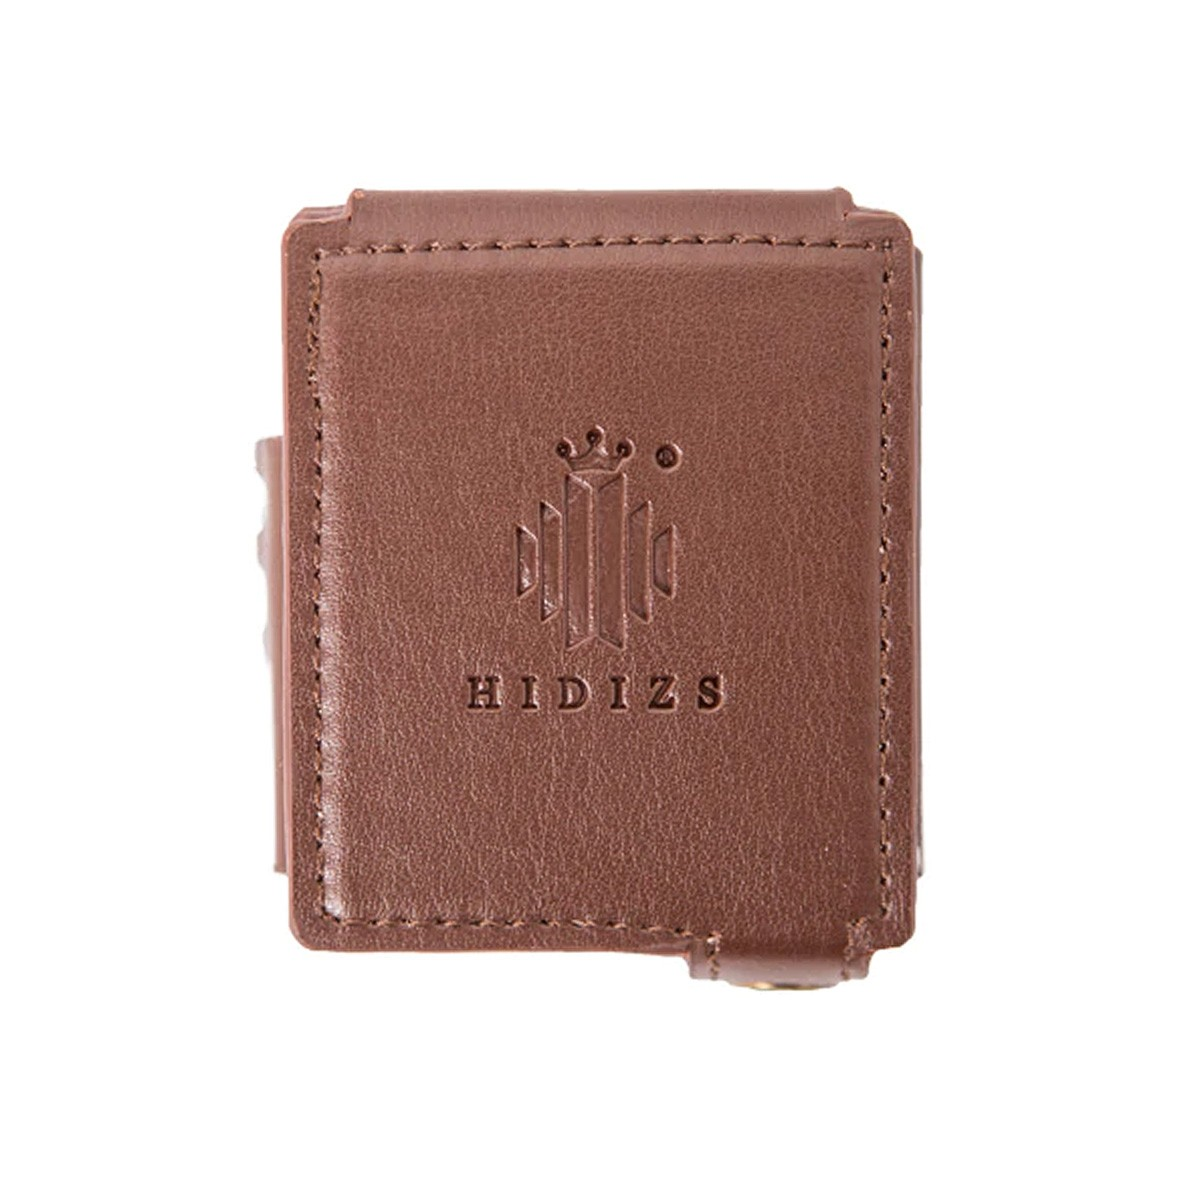 HIDIZS Leatherette Protective Cover for Hidizs AP80 Brown